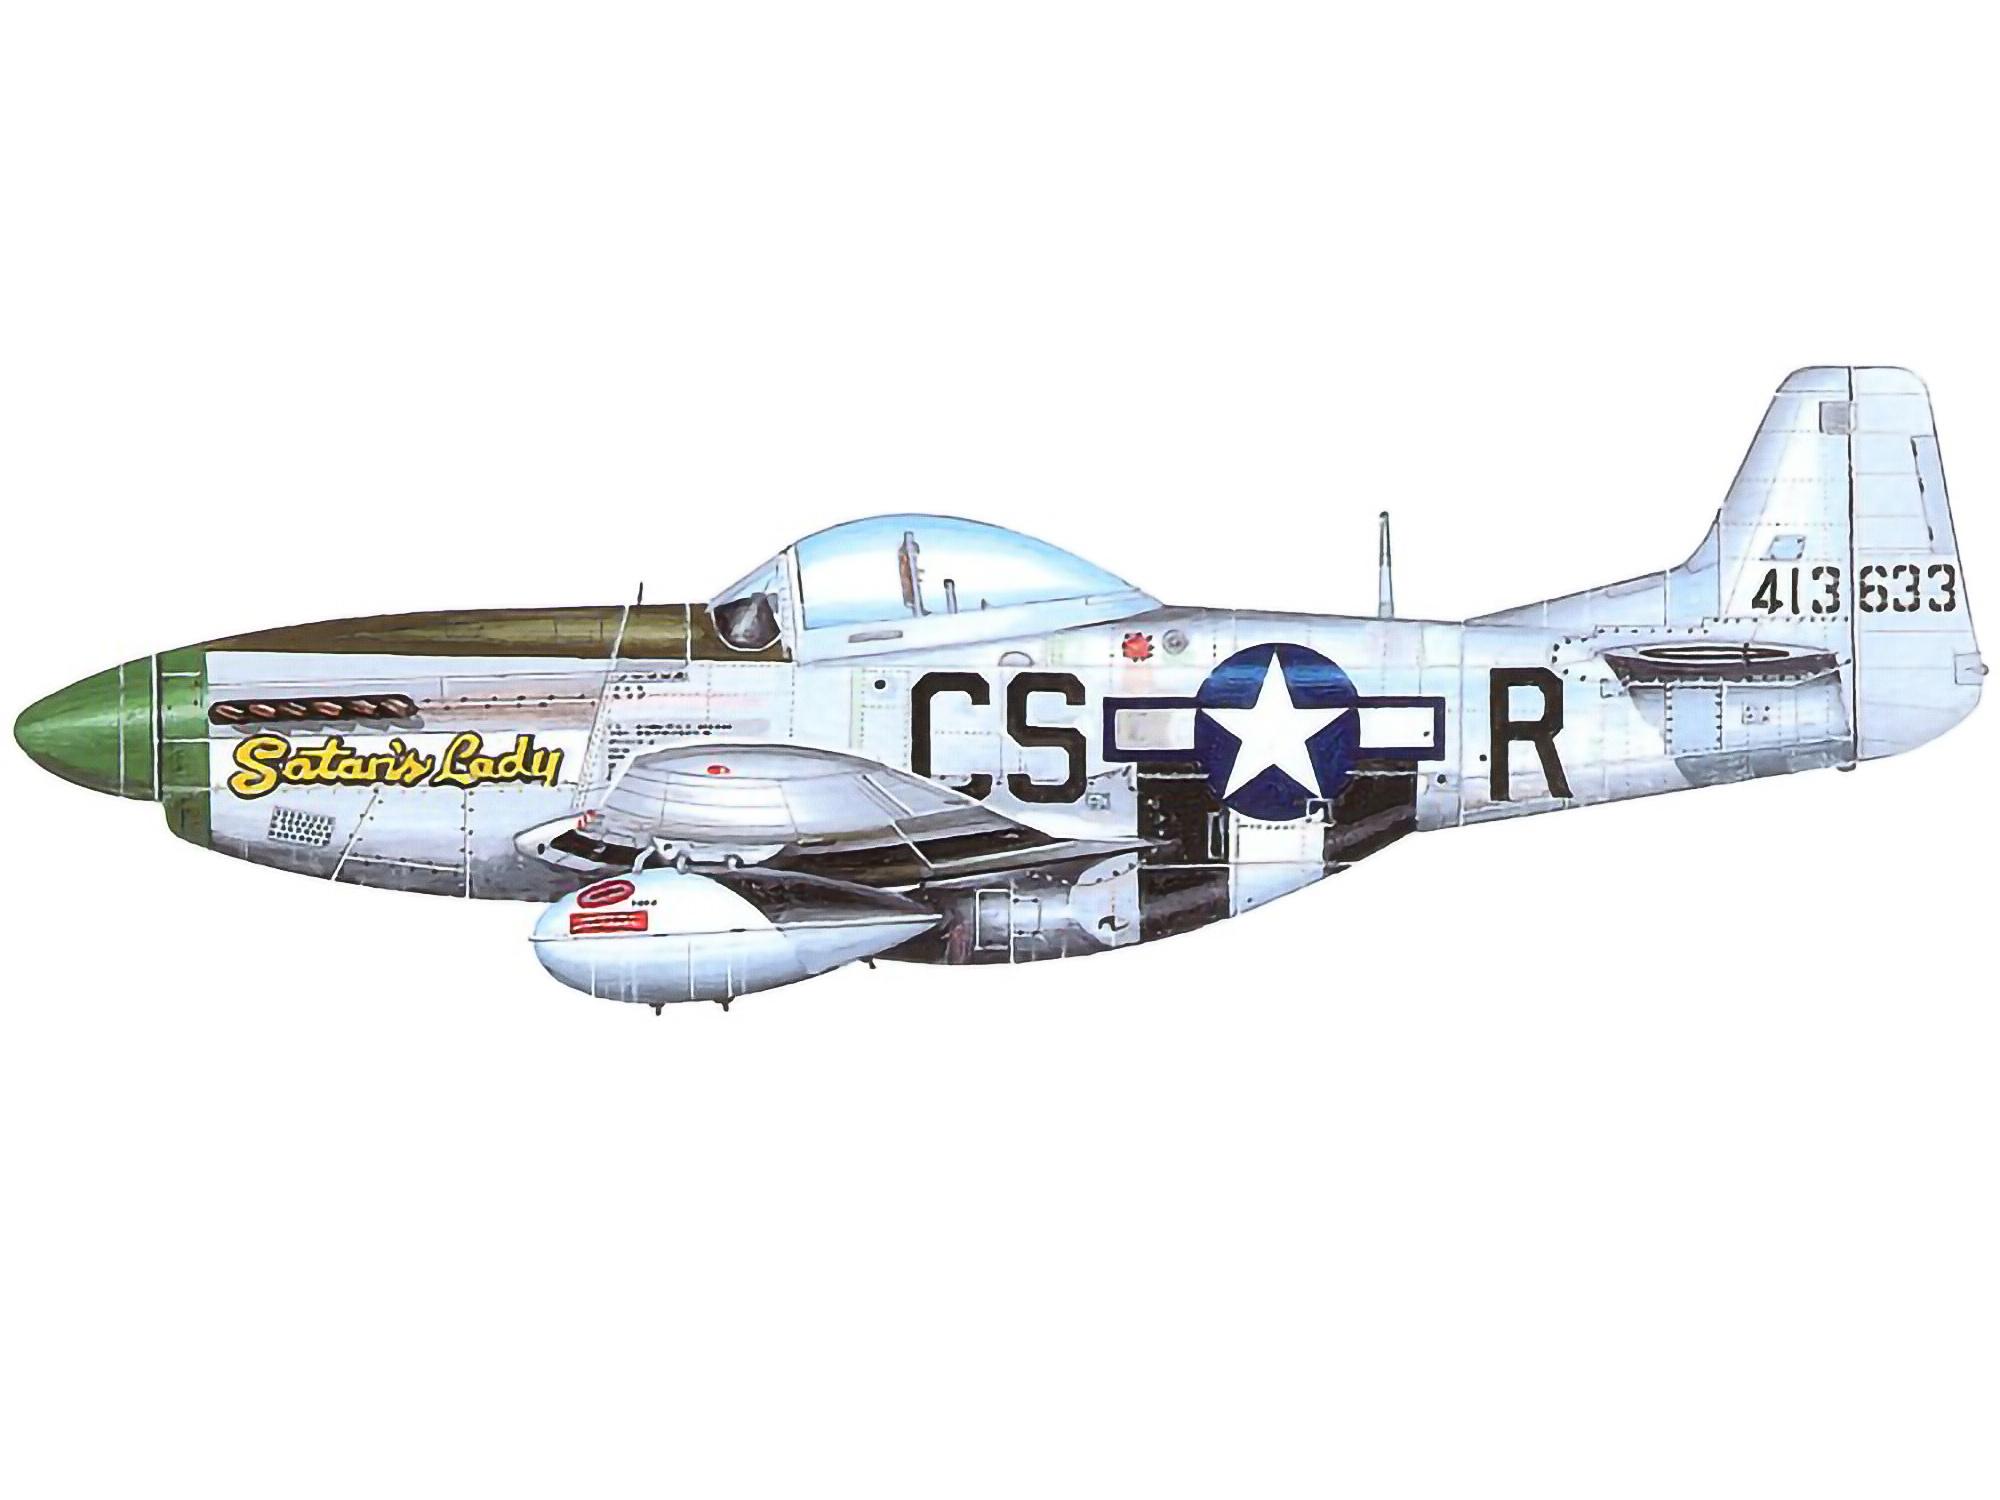 P-51D – Satan's Lady – 44-13633